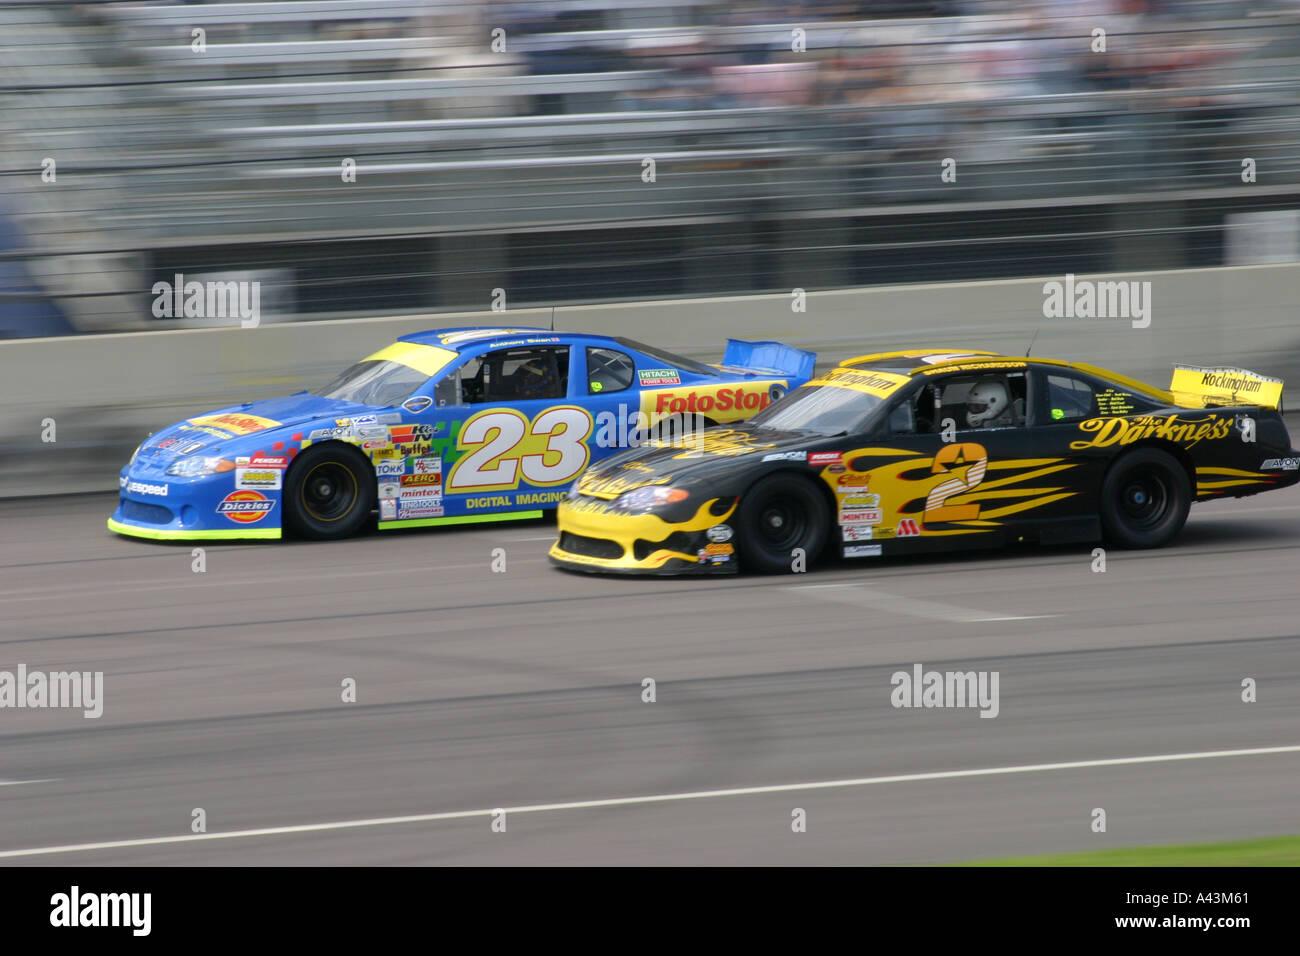 Two V8 Nascar racing cars Stock Photo: 3565664 - Alamy